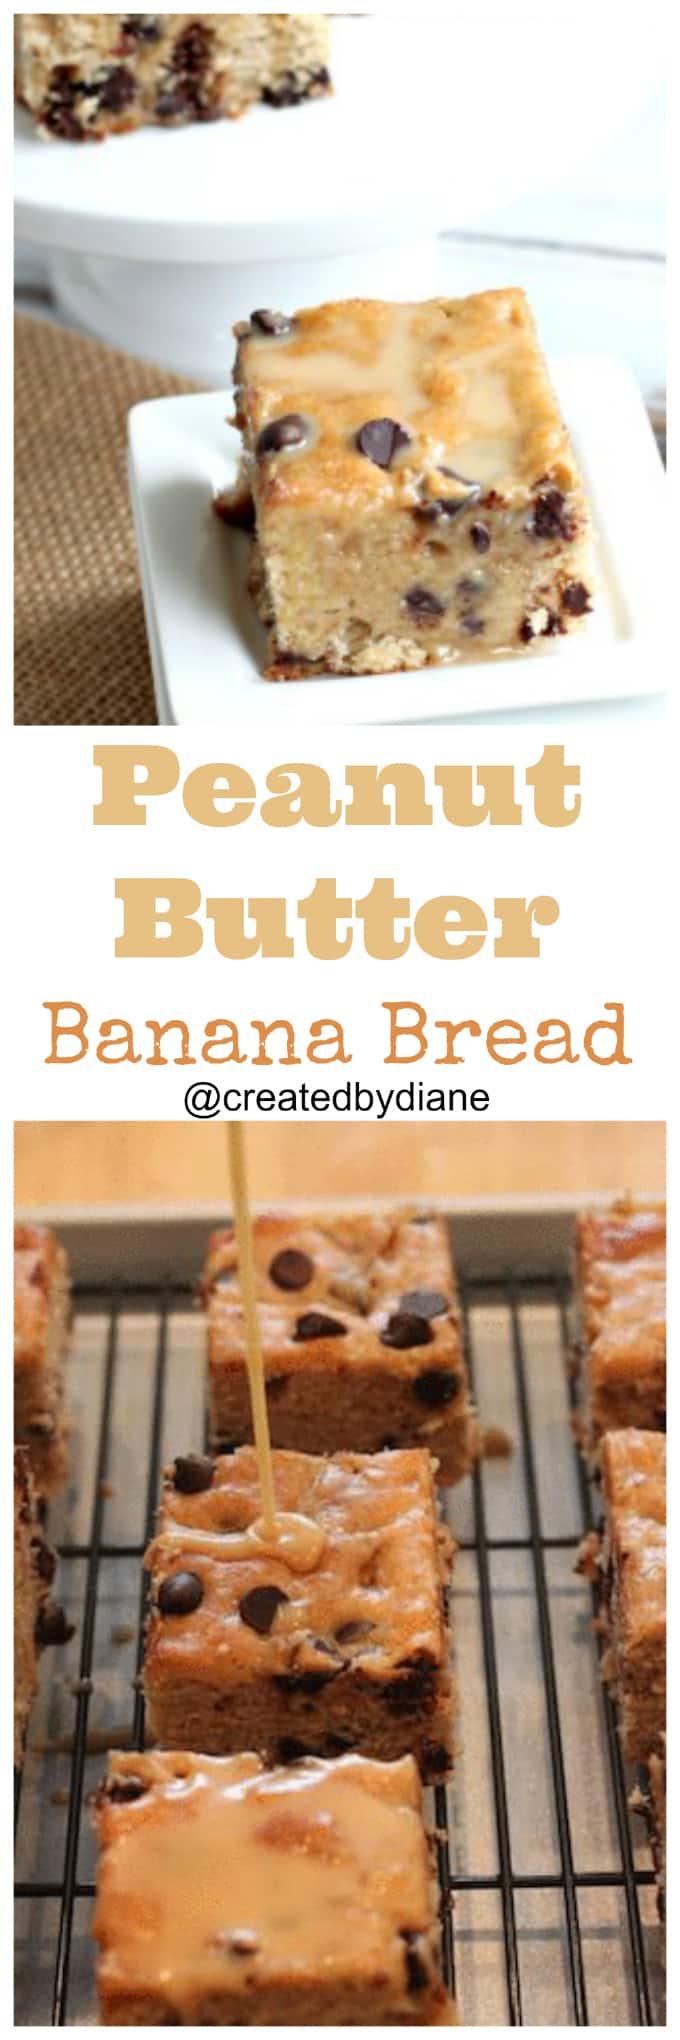 peanut-butter-banana-bread-createdbydiane